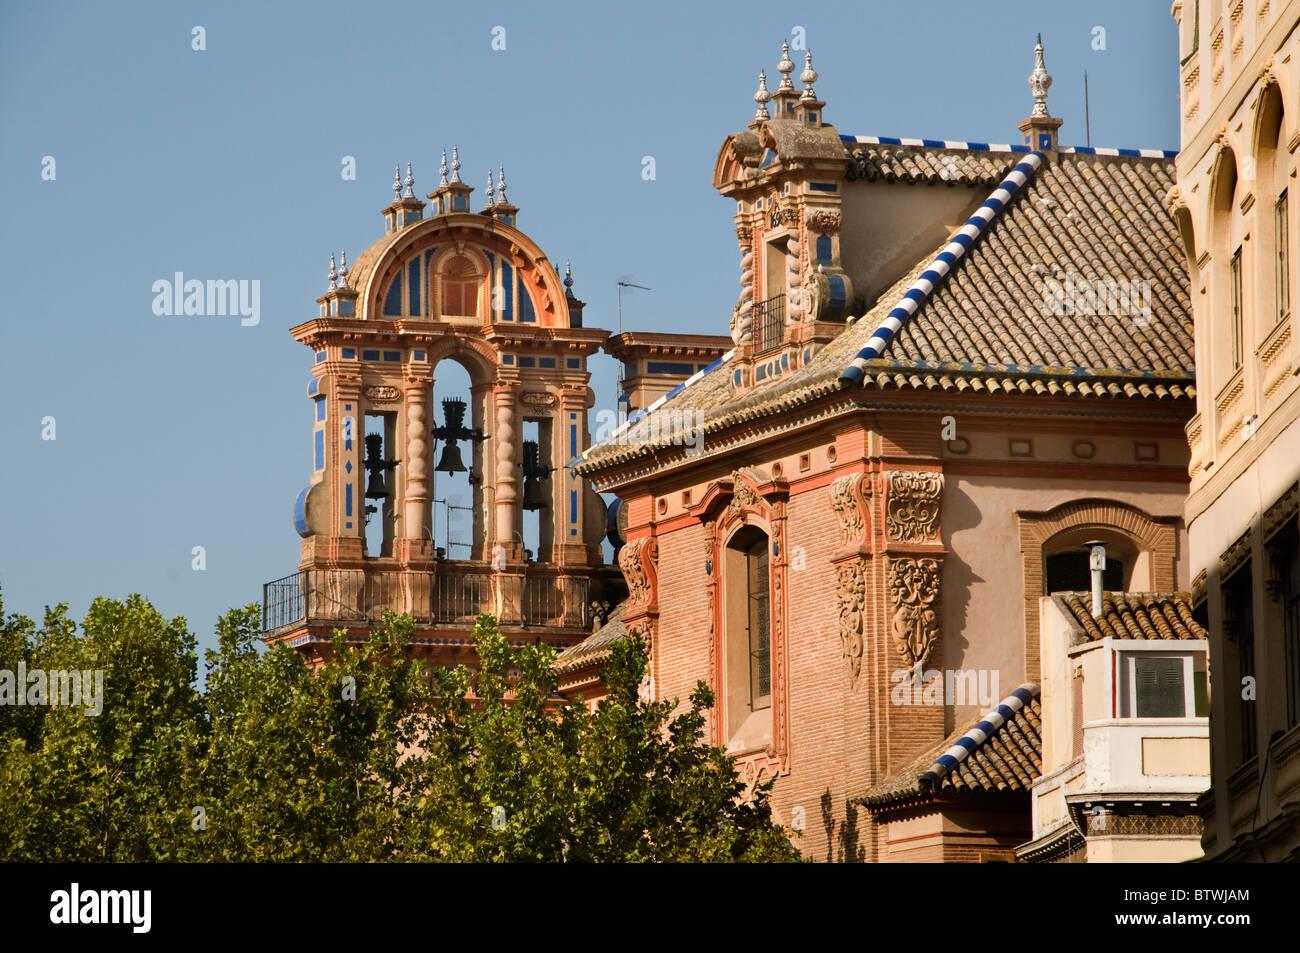 Seville Spain Iglesia de la Magdalena  Church - Stock Image